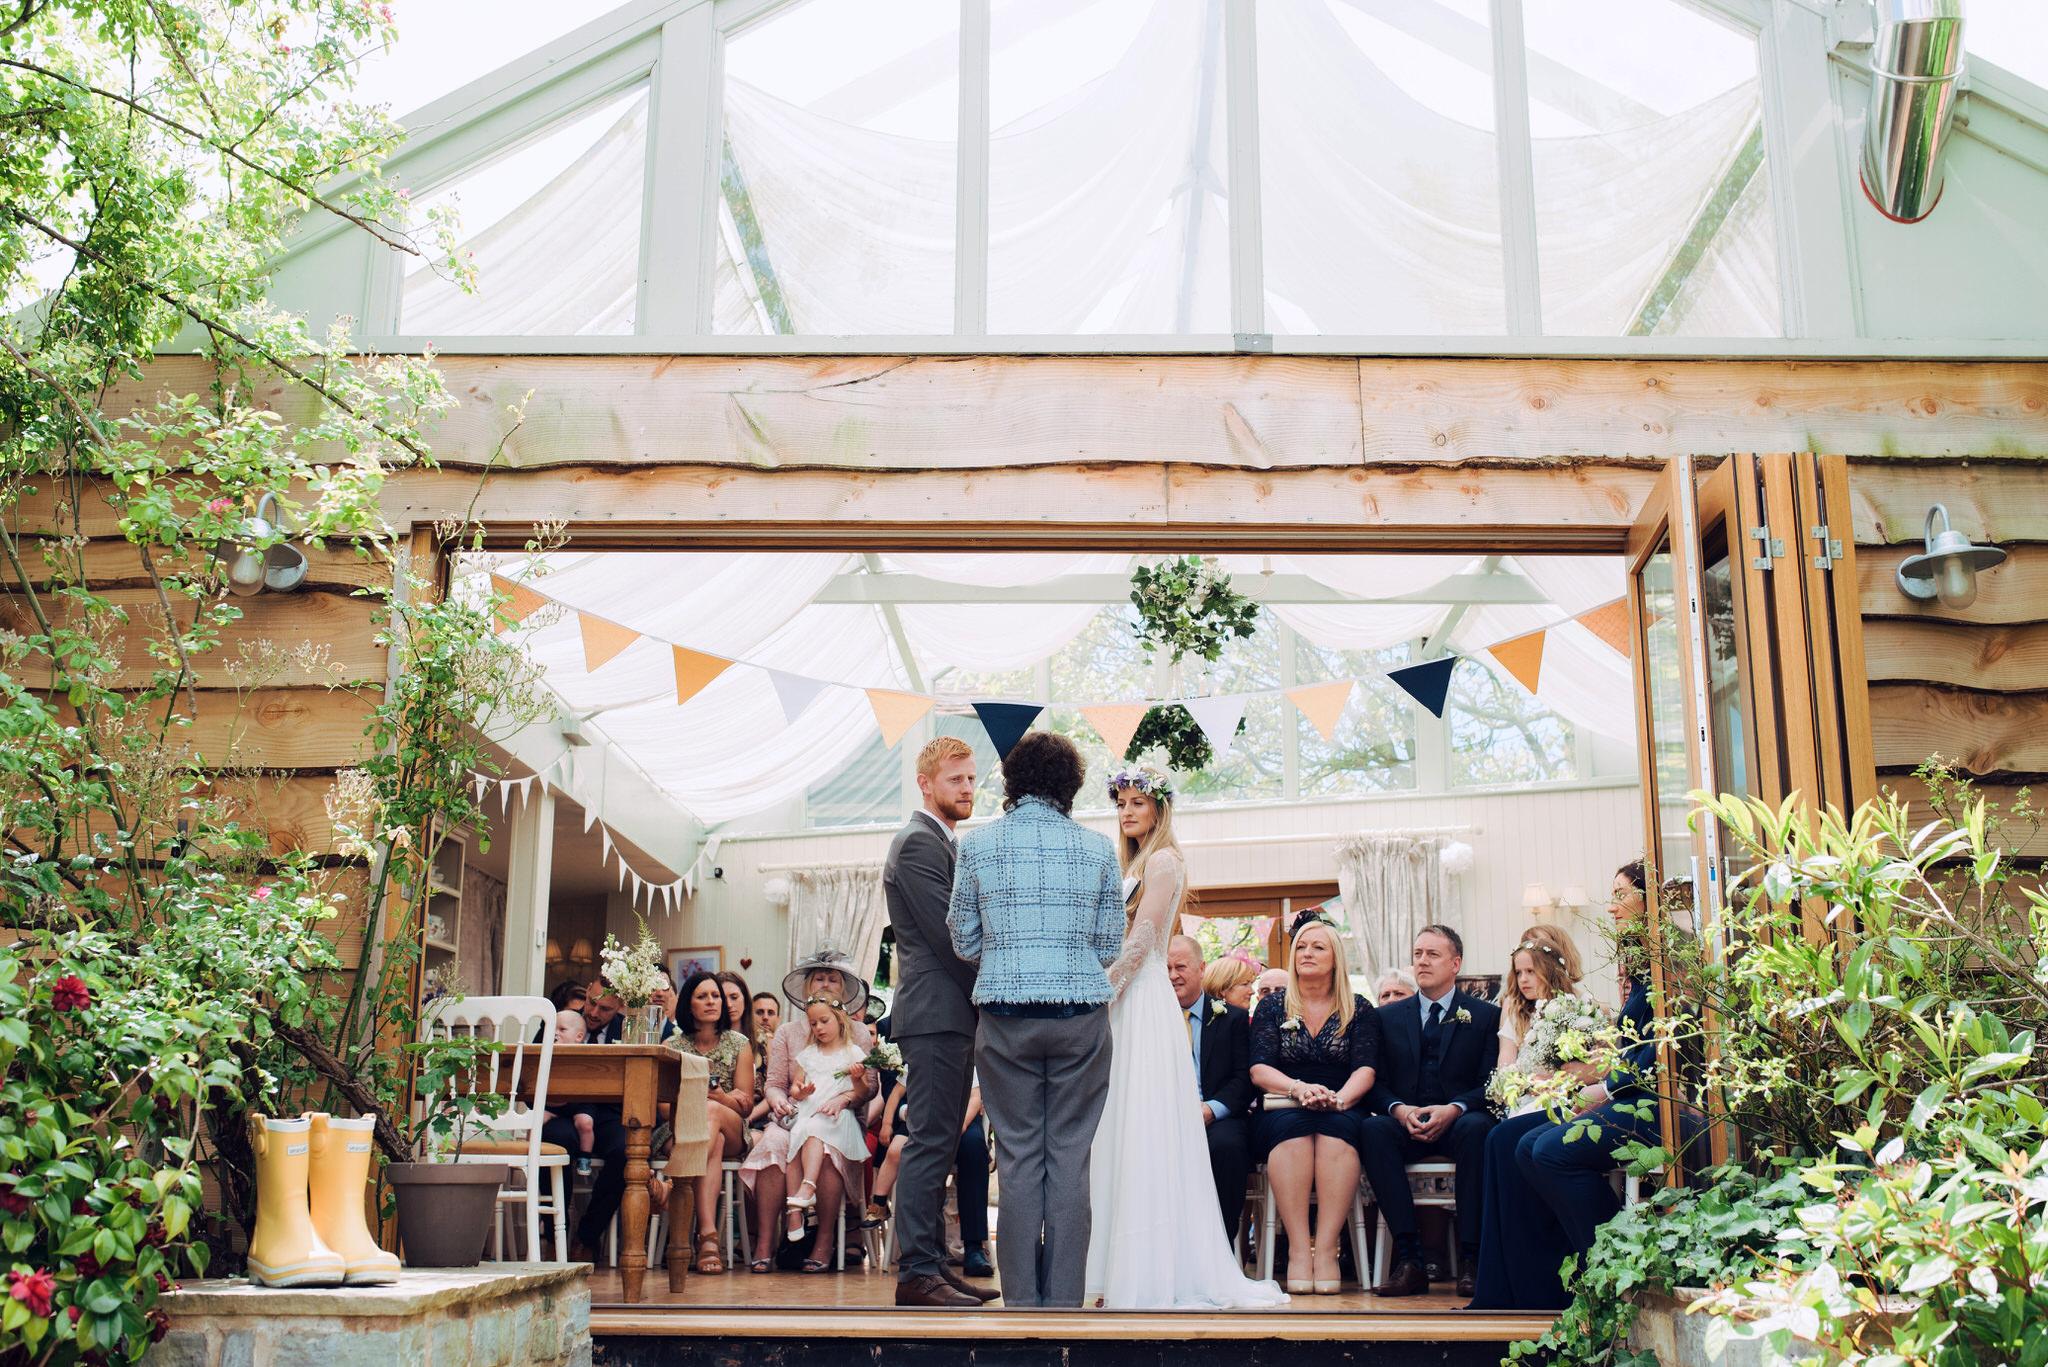 Huntstile organic farm wedding ceremony